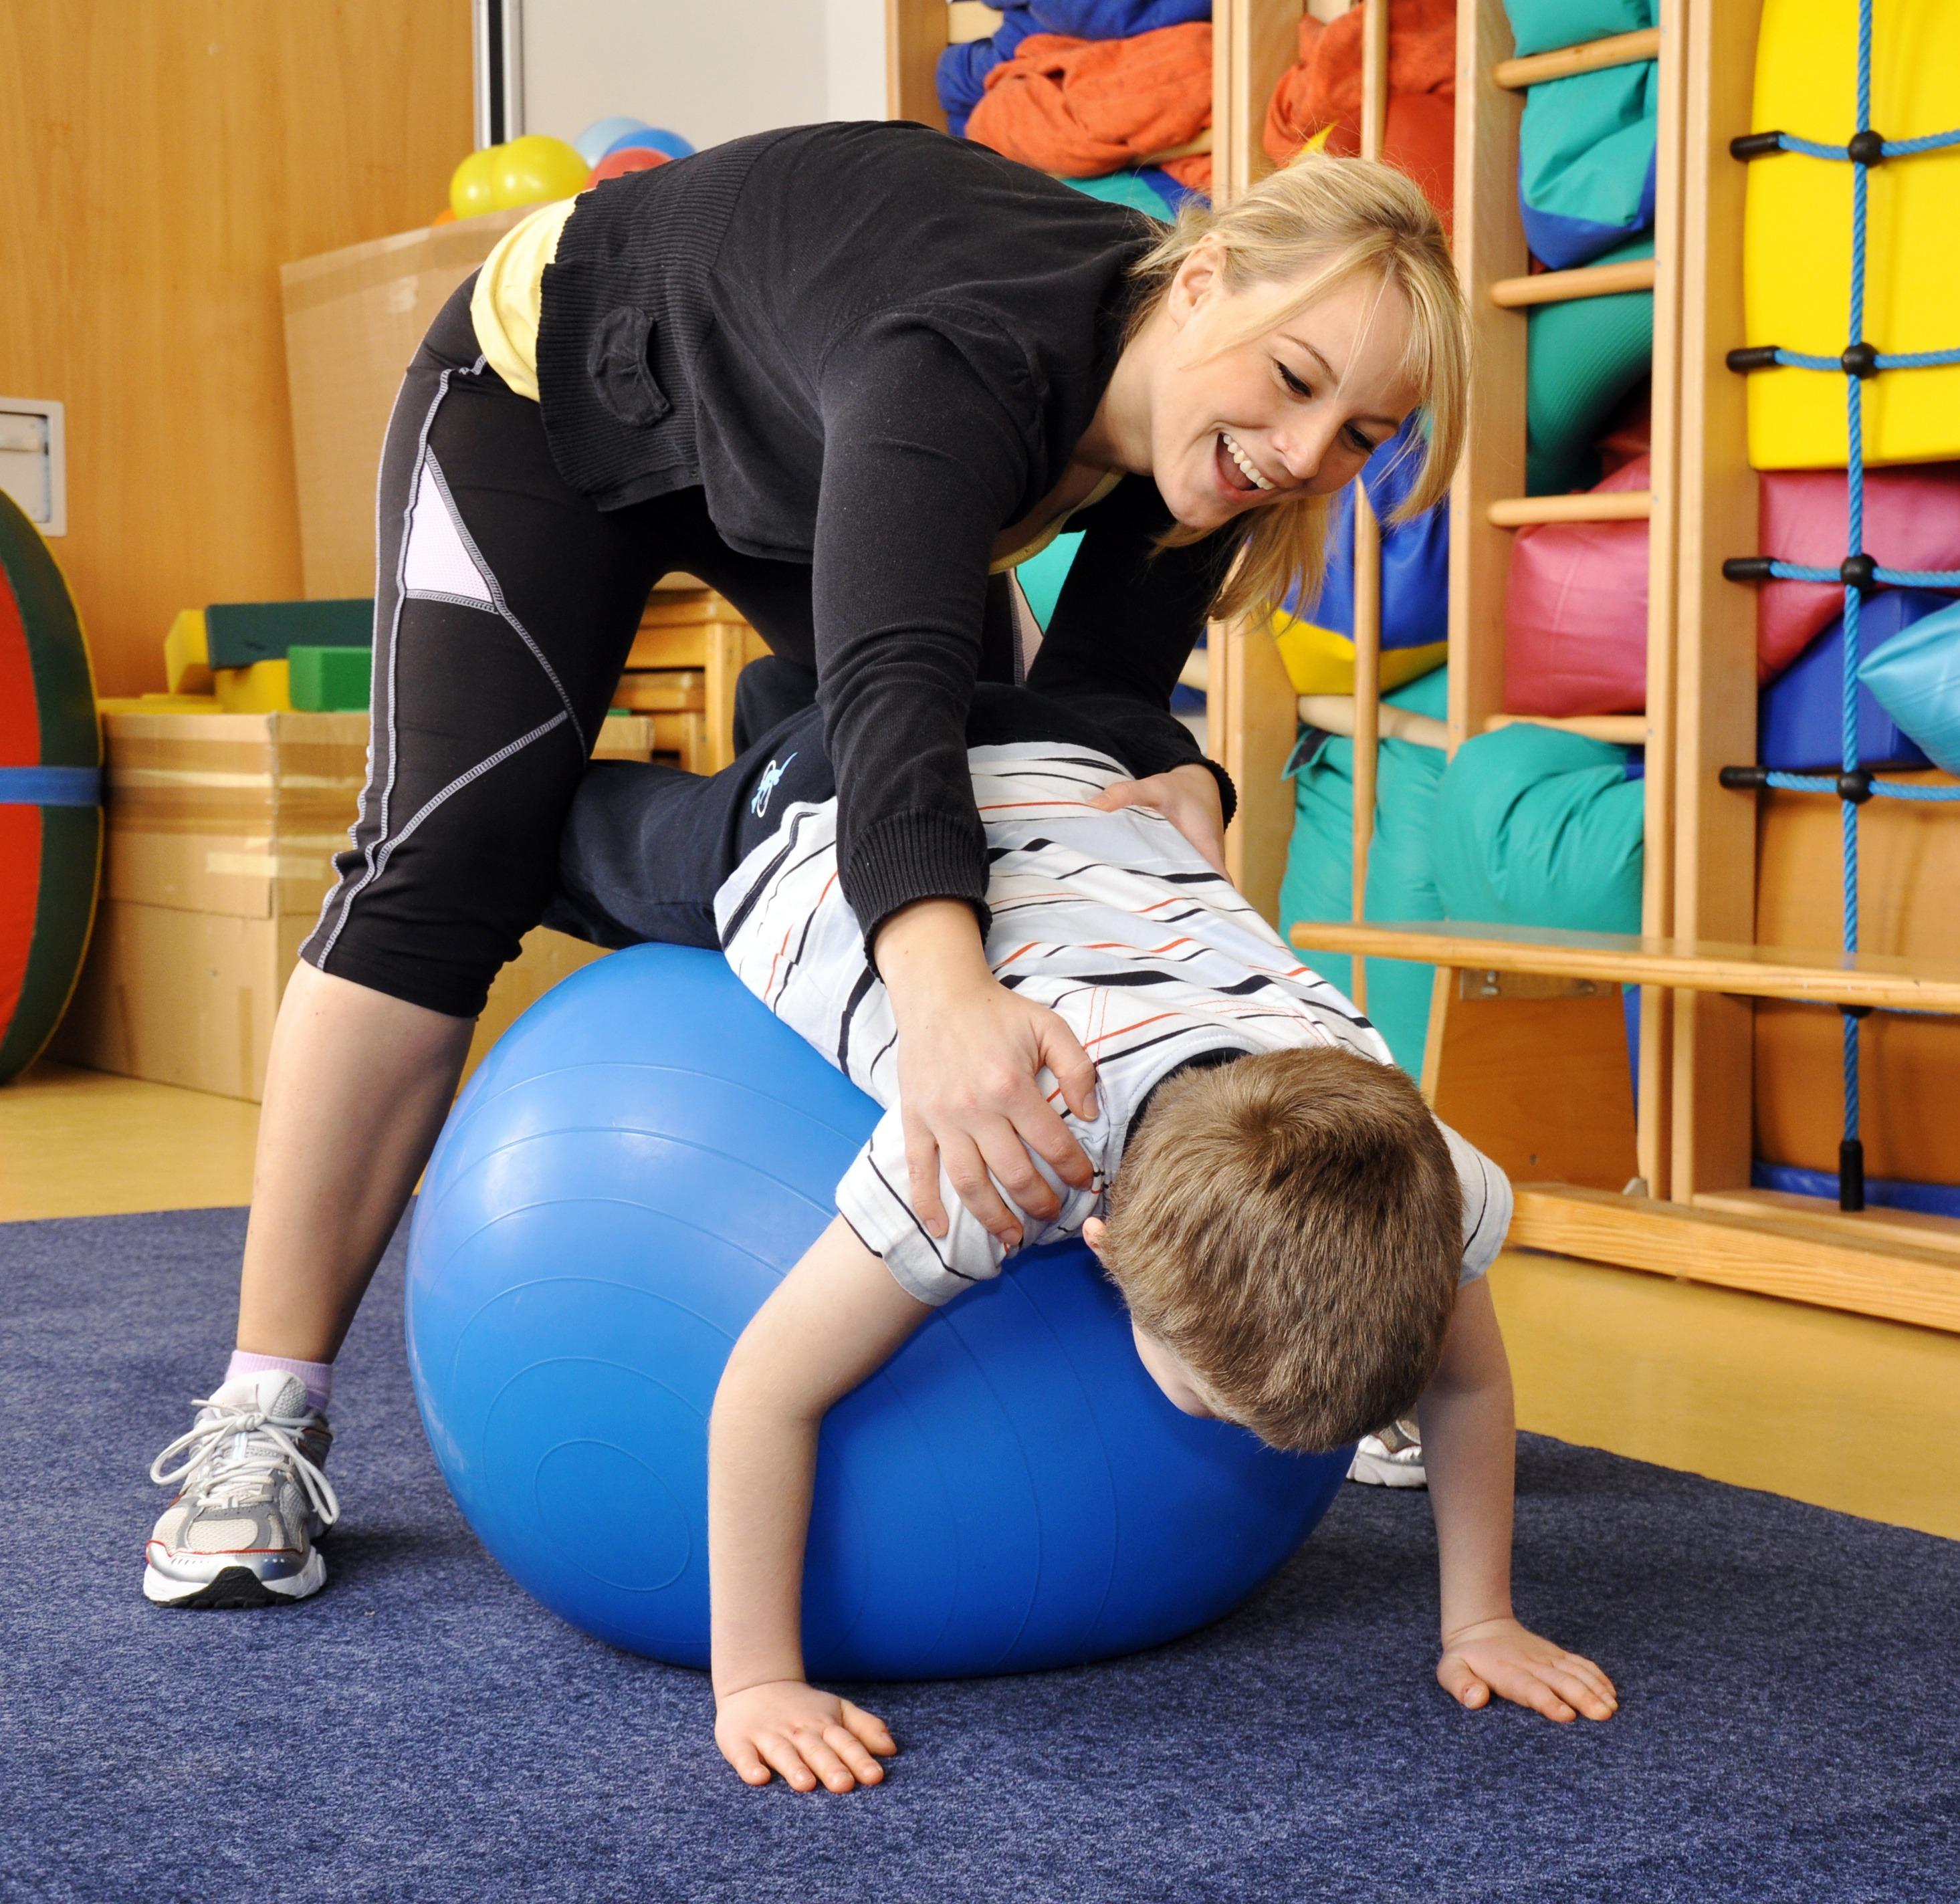 Kidz Pediatric Physical Therapy